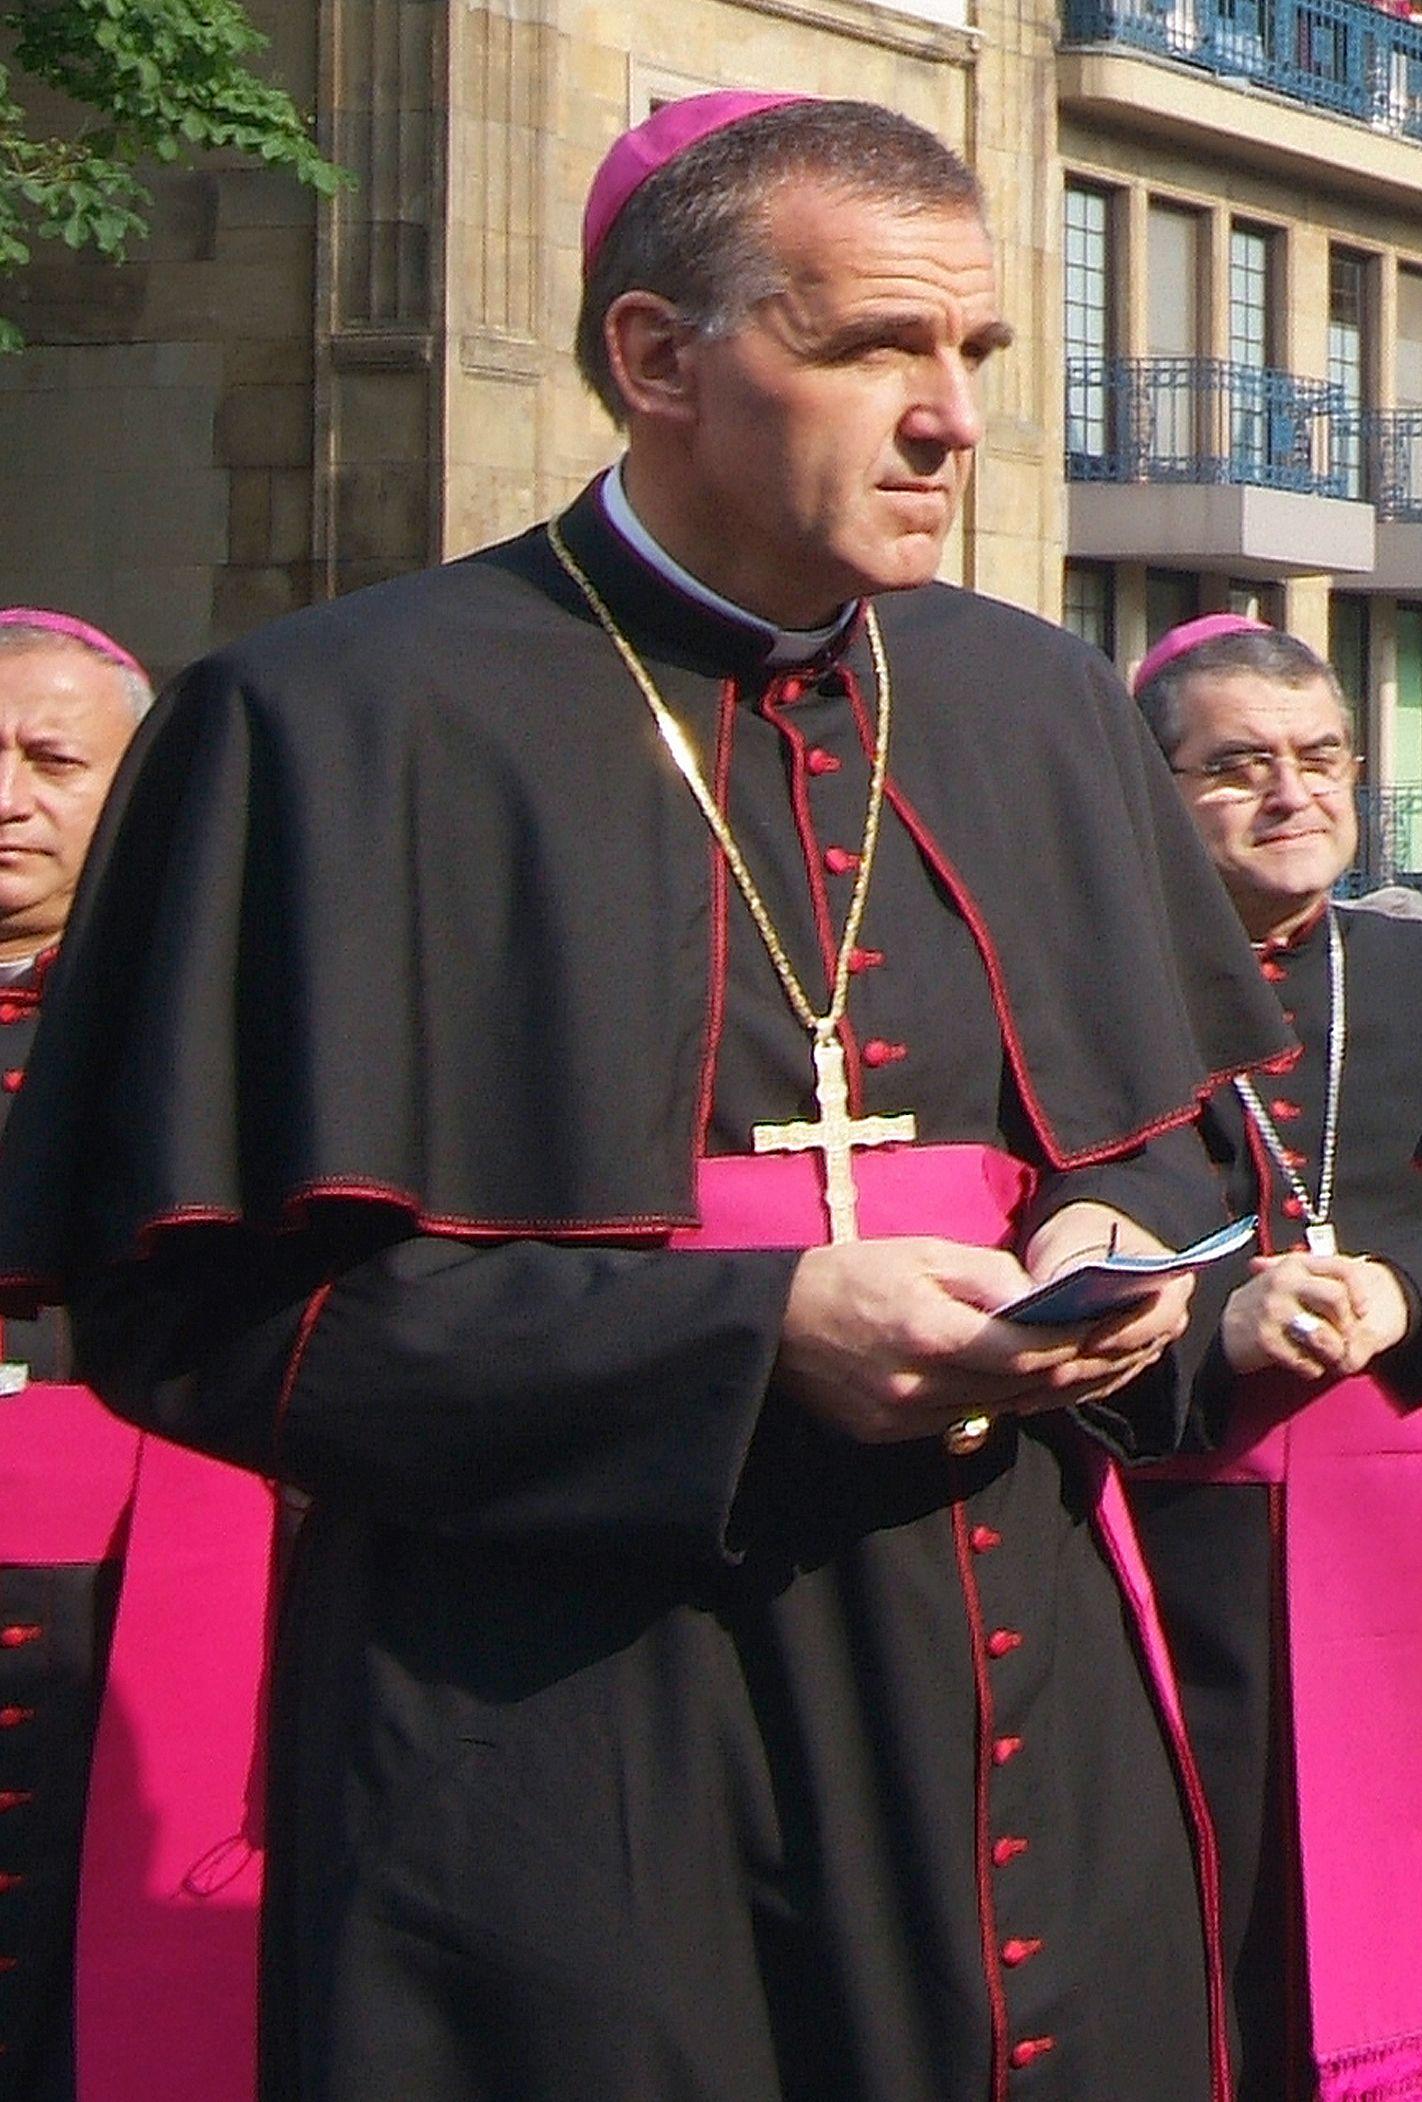 Aachener Weihbischof wegen Untreue angeklagt